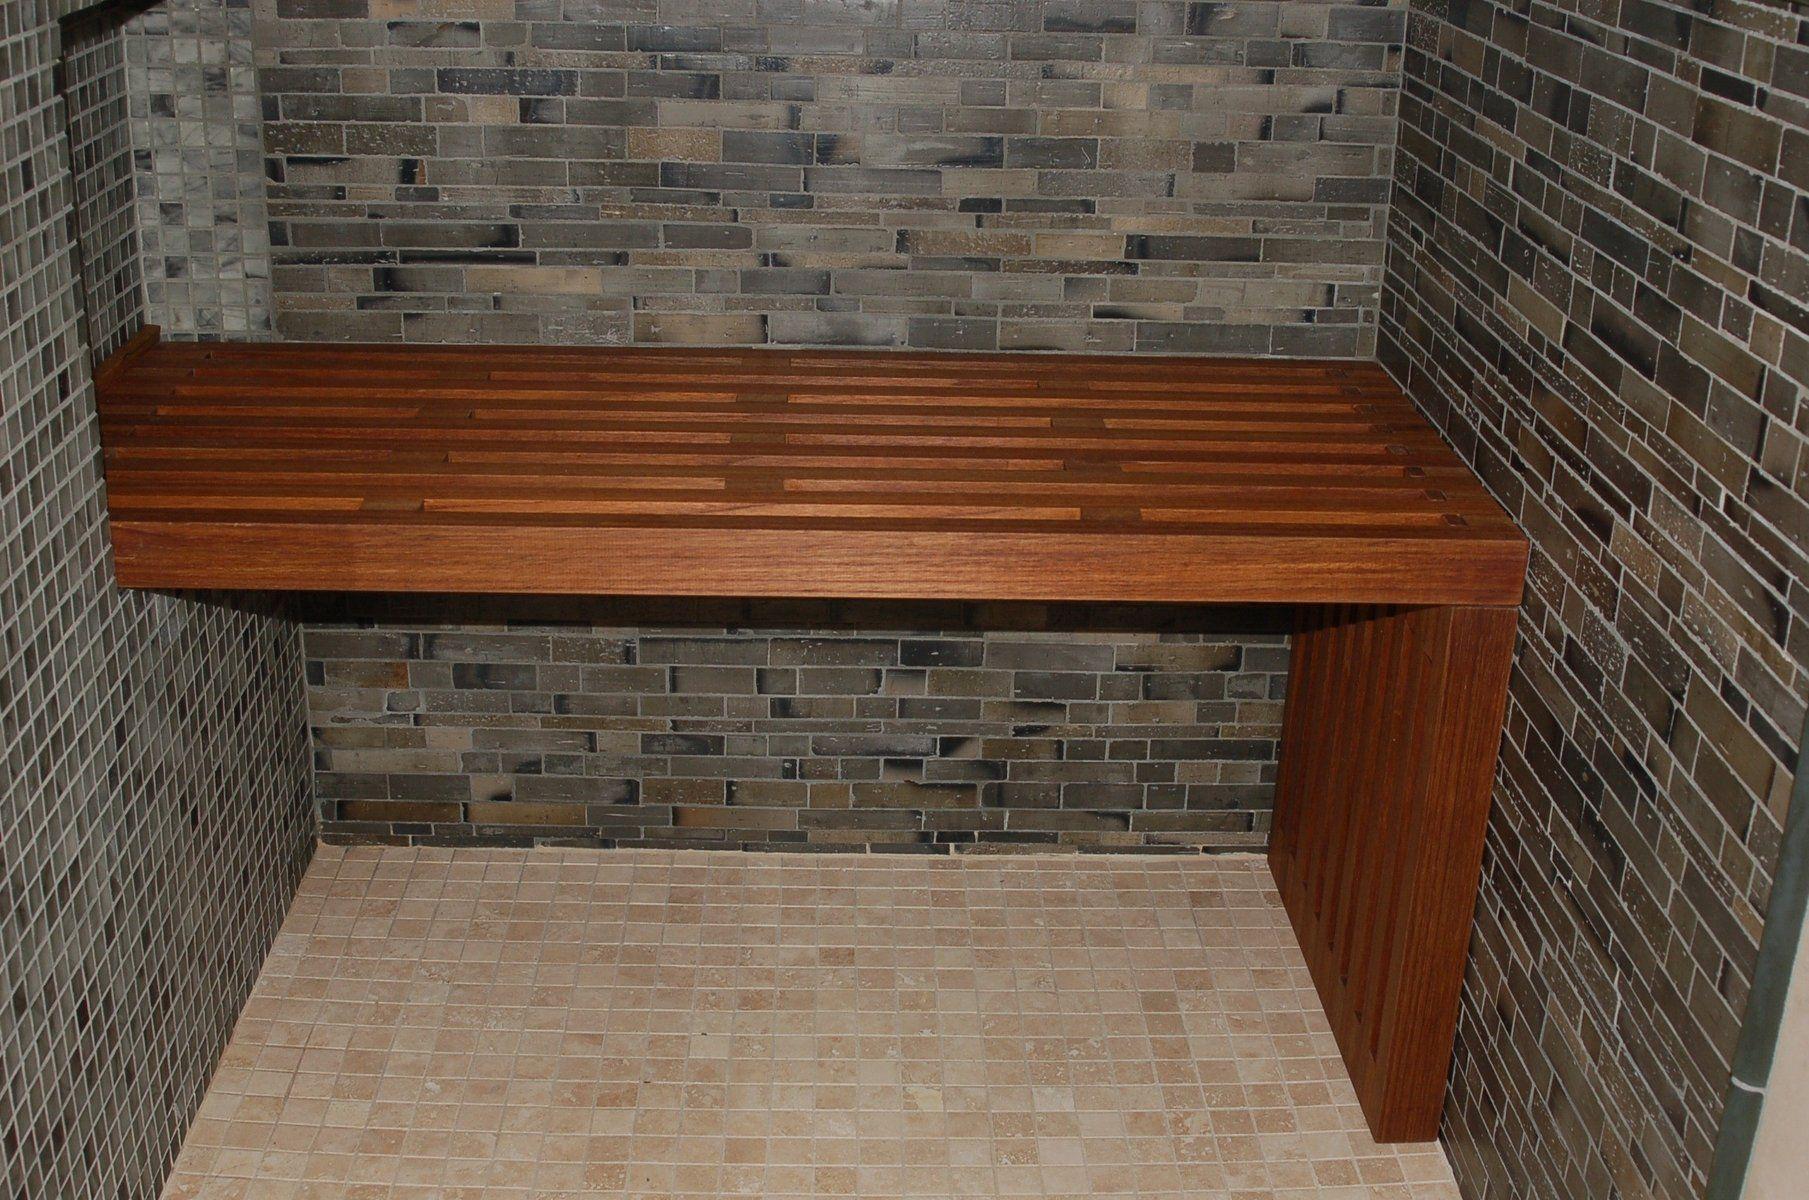 Teak Shower Bench for Your Breathtaking Furniture Ideas: Handicapped ...